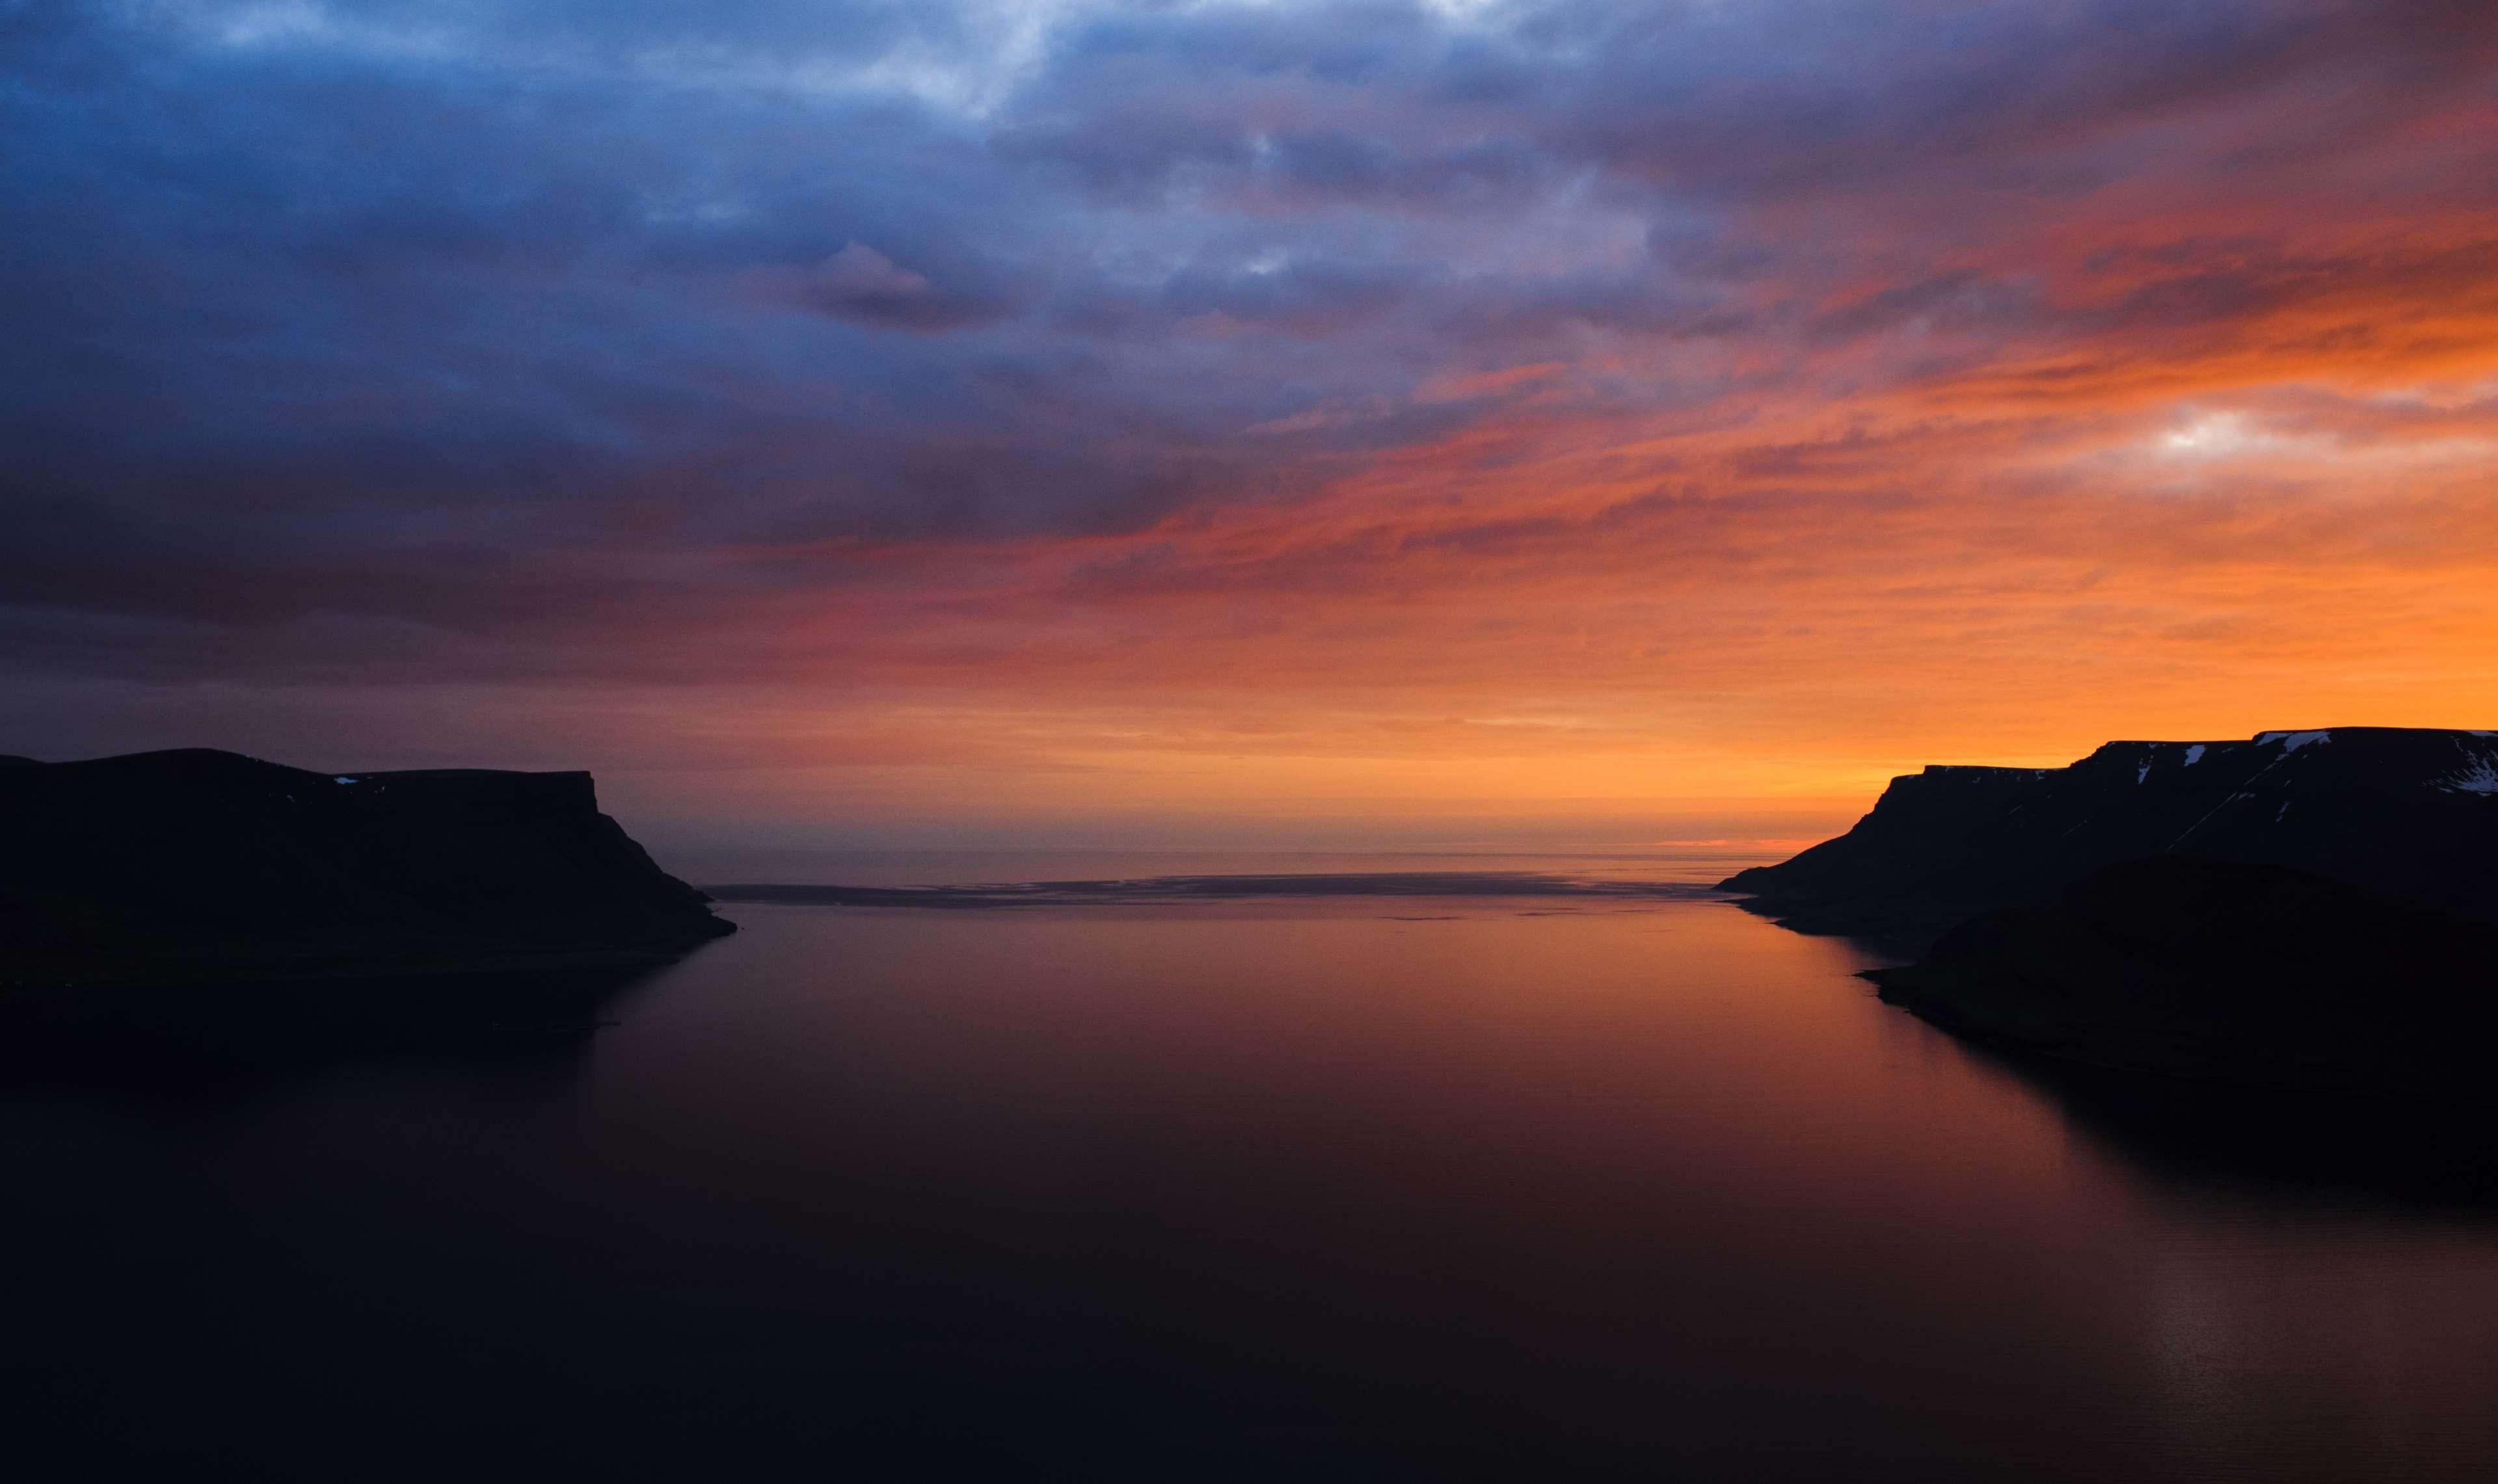 Black Blue Cliffs Landscape Ocean Orange Scenery Sunrise Sunset Water Landscape Photography Tutorial Landscape Photography Best Landscape Photography